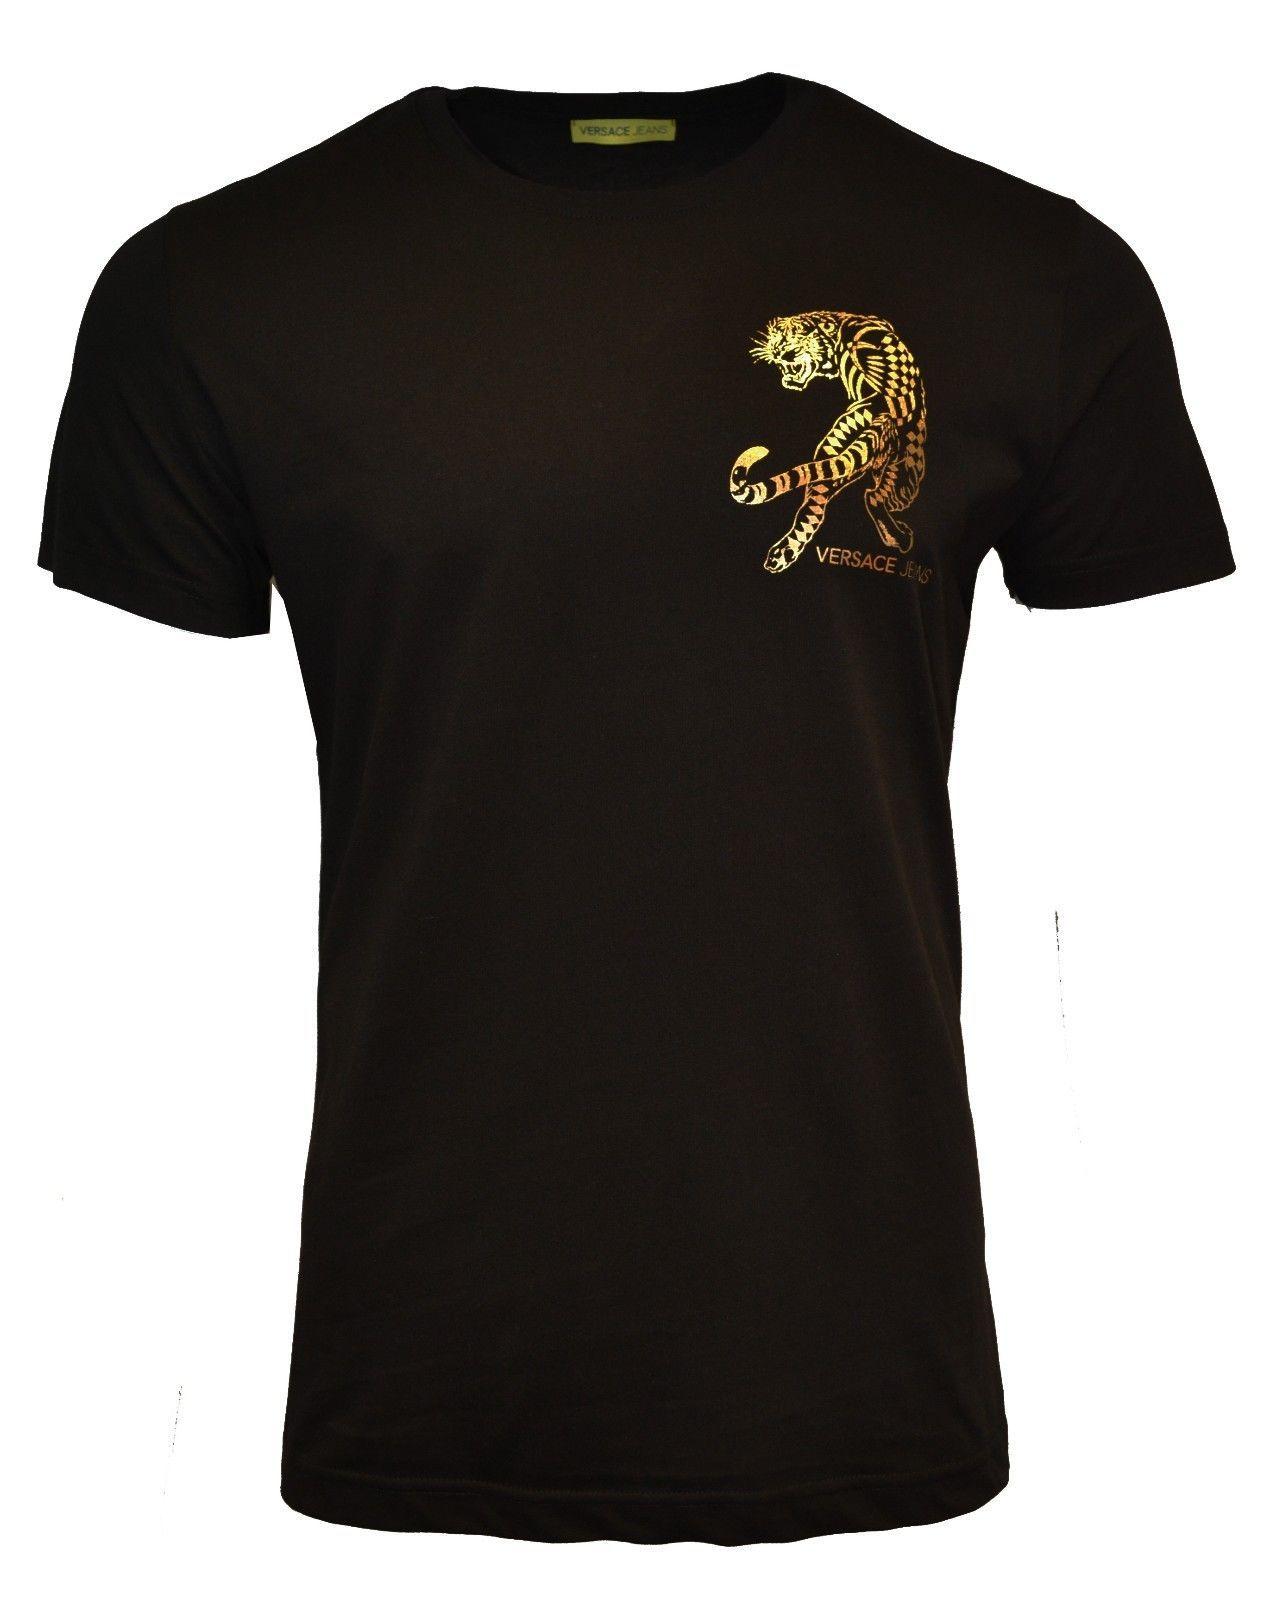 38eb499e 91.62 | BNWT VERSACE JEANS CHEST LOGO TIGER T-SHIRT BLACK & GOLD